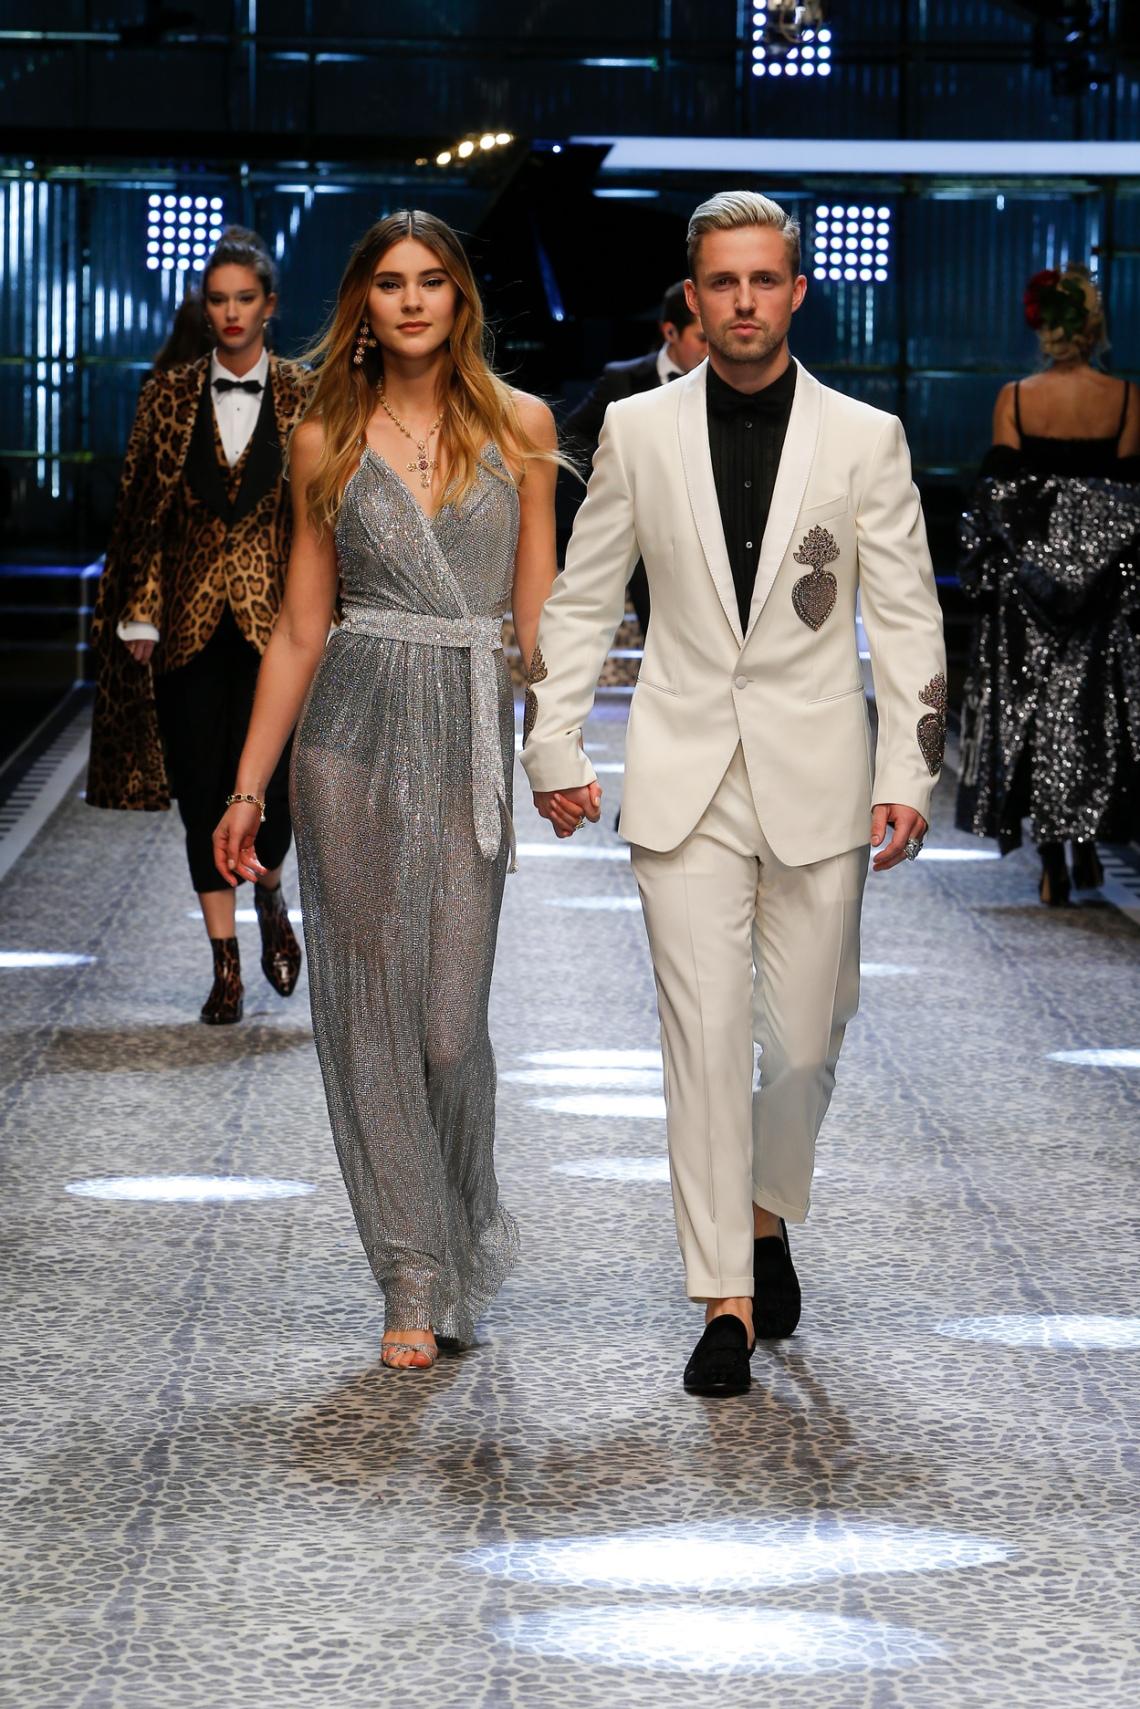 dolce-and-gabbana-fall-winter-2017-18-women-fashion-show-runway-90